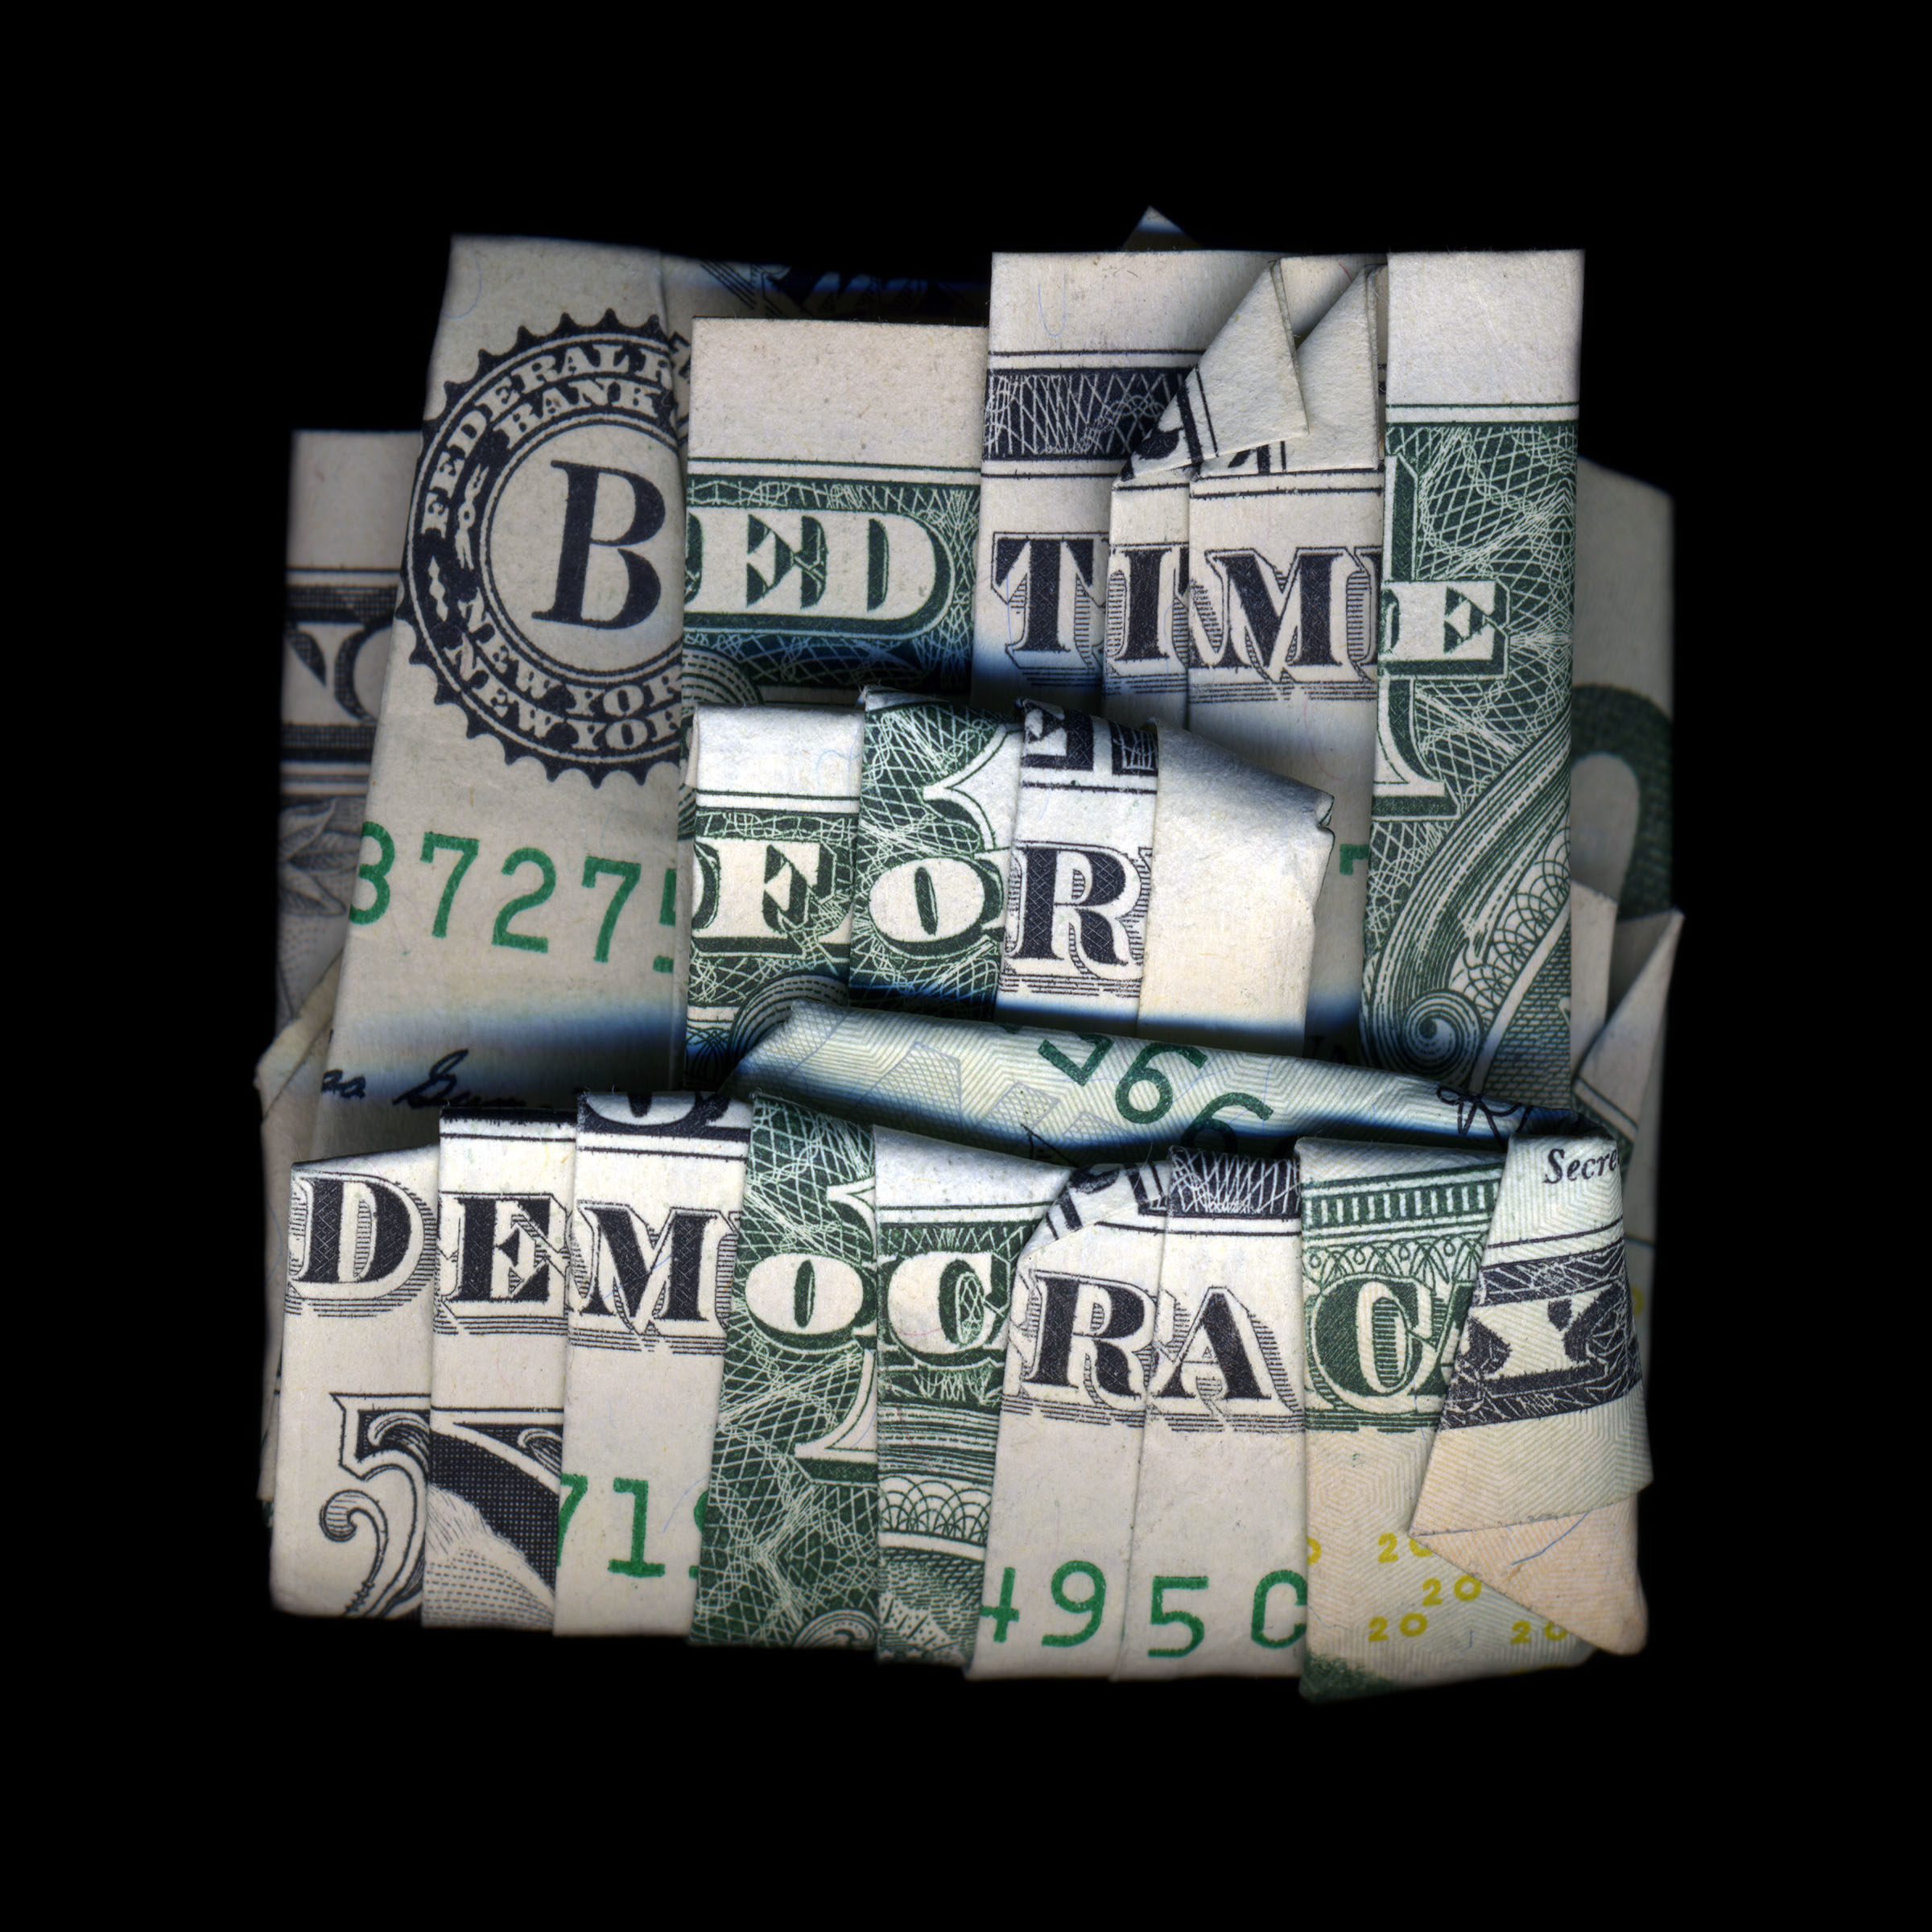 Bedtime for Democracy